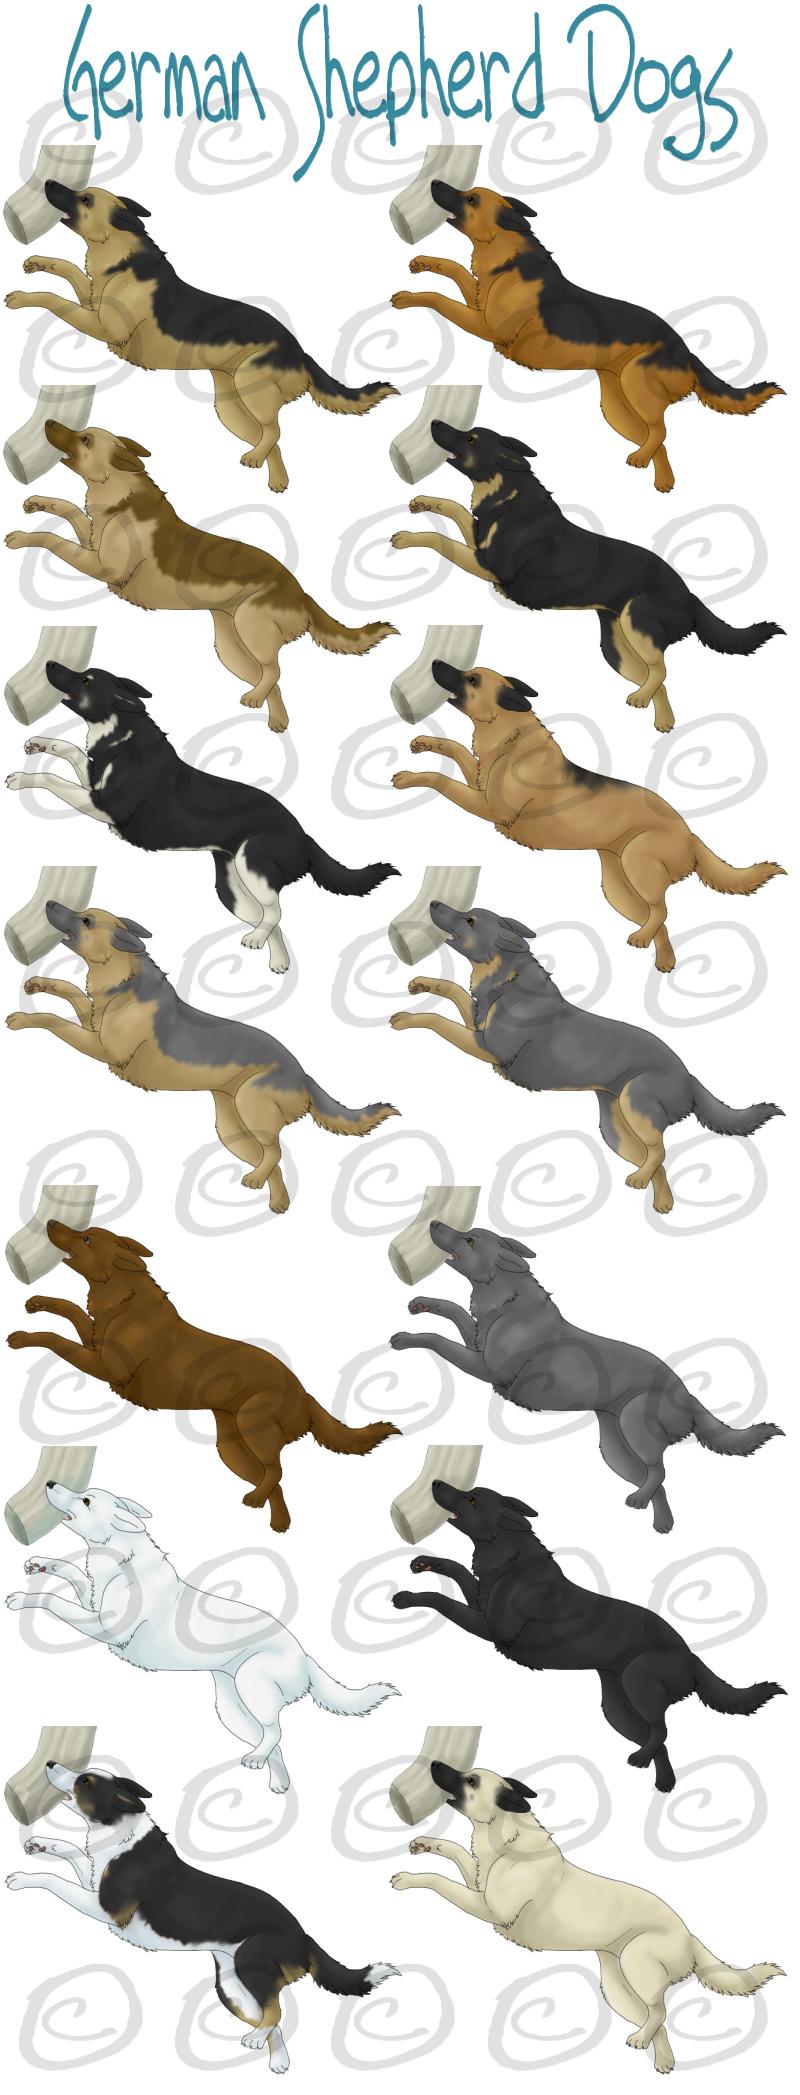 German Shepherd Dogsbydalmatianluver